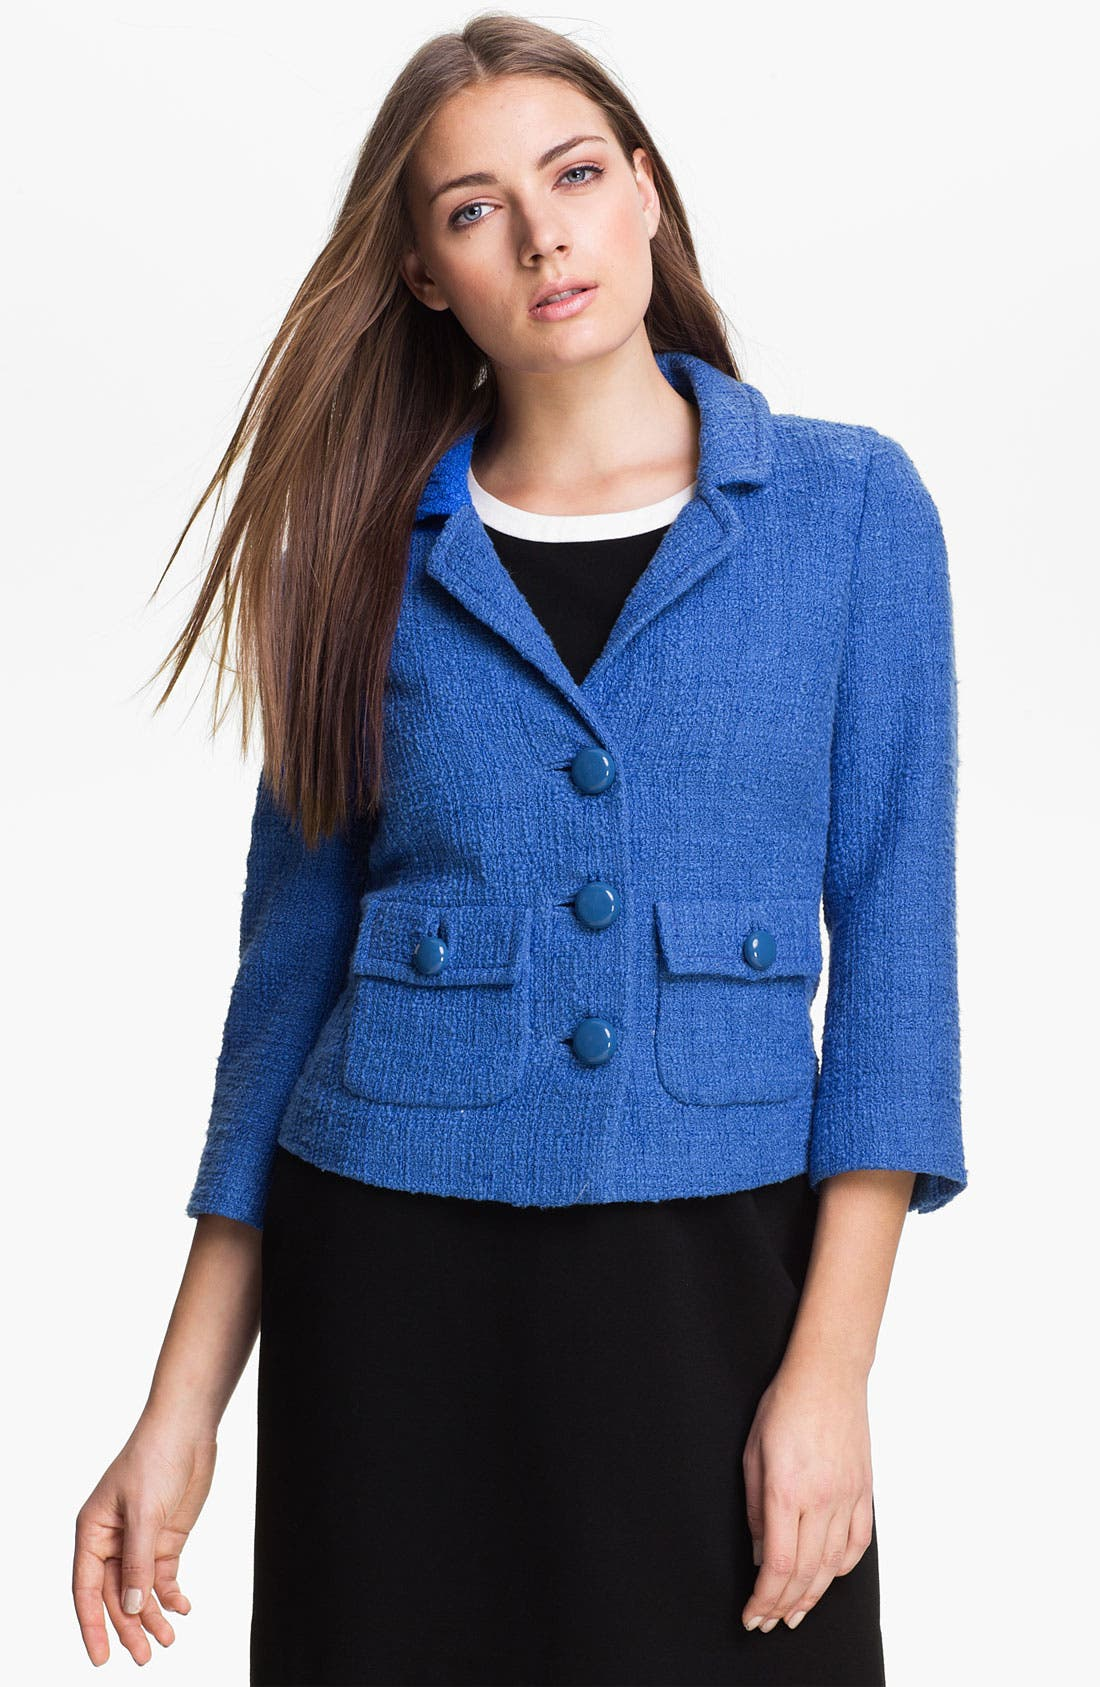 Alternate Image 1 Selected - kate spade new york 'hadley' jacket